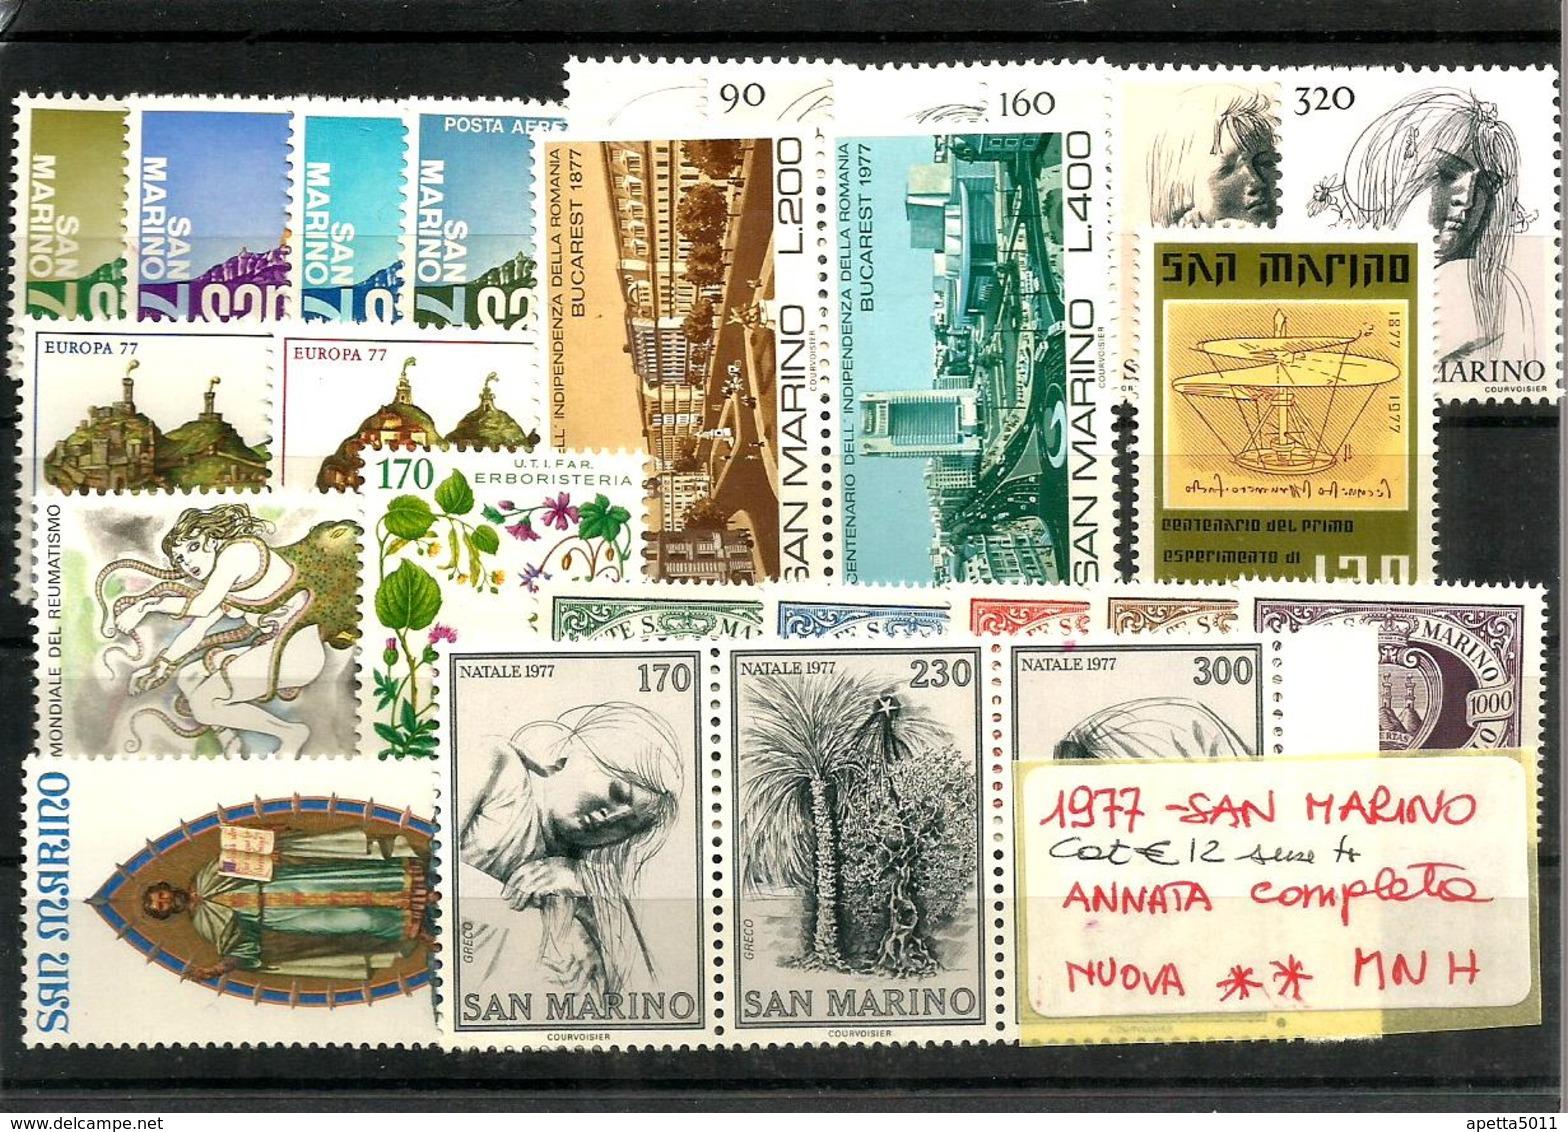 1977 SAN MARINO Annata Completa Nuova ** MNH - Nuovi